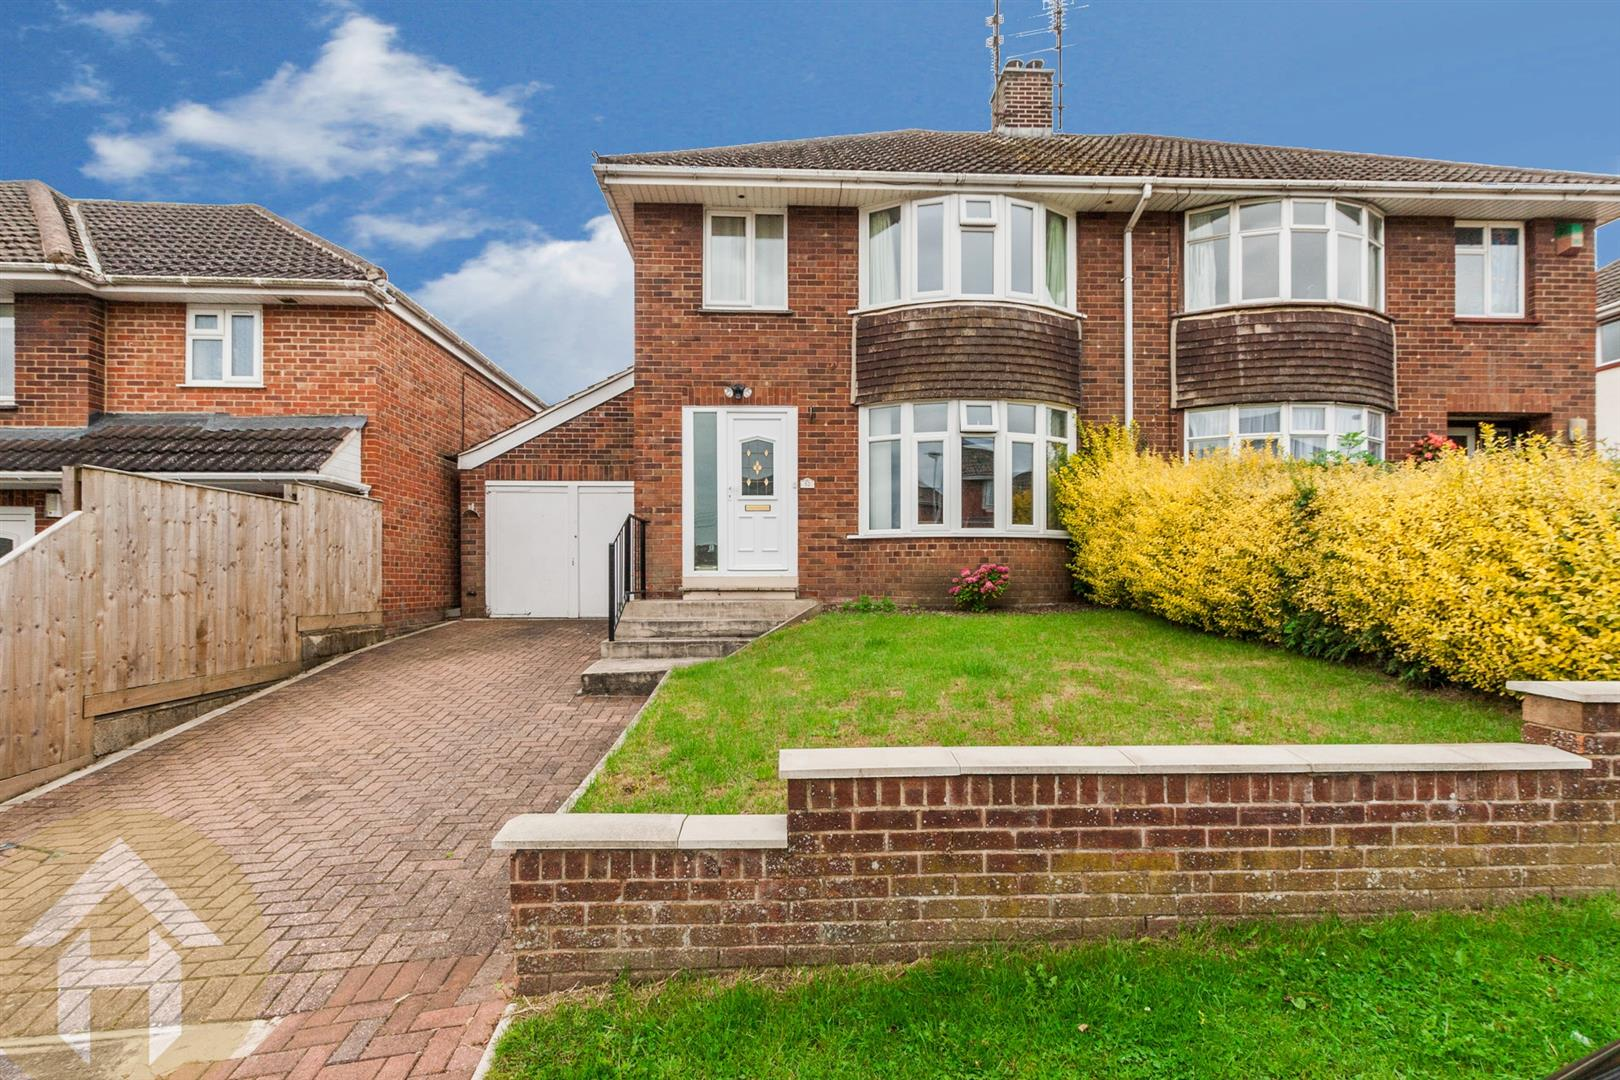 3 Bedrooms Property for sale in Longleaze, Royal Wootton Bassett